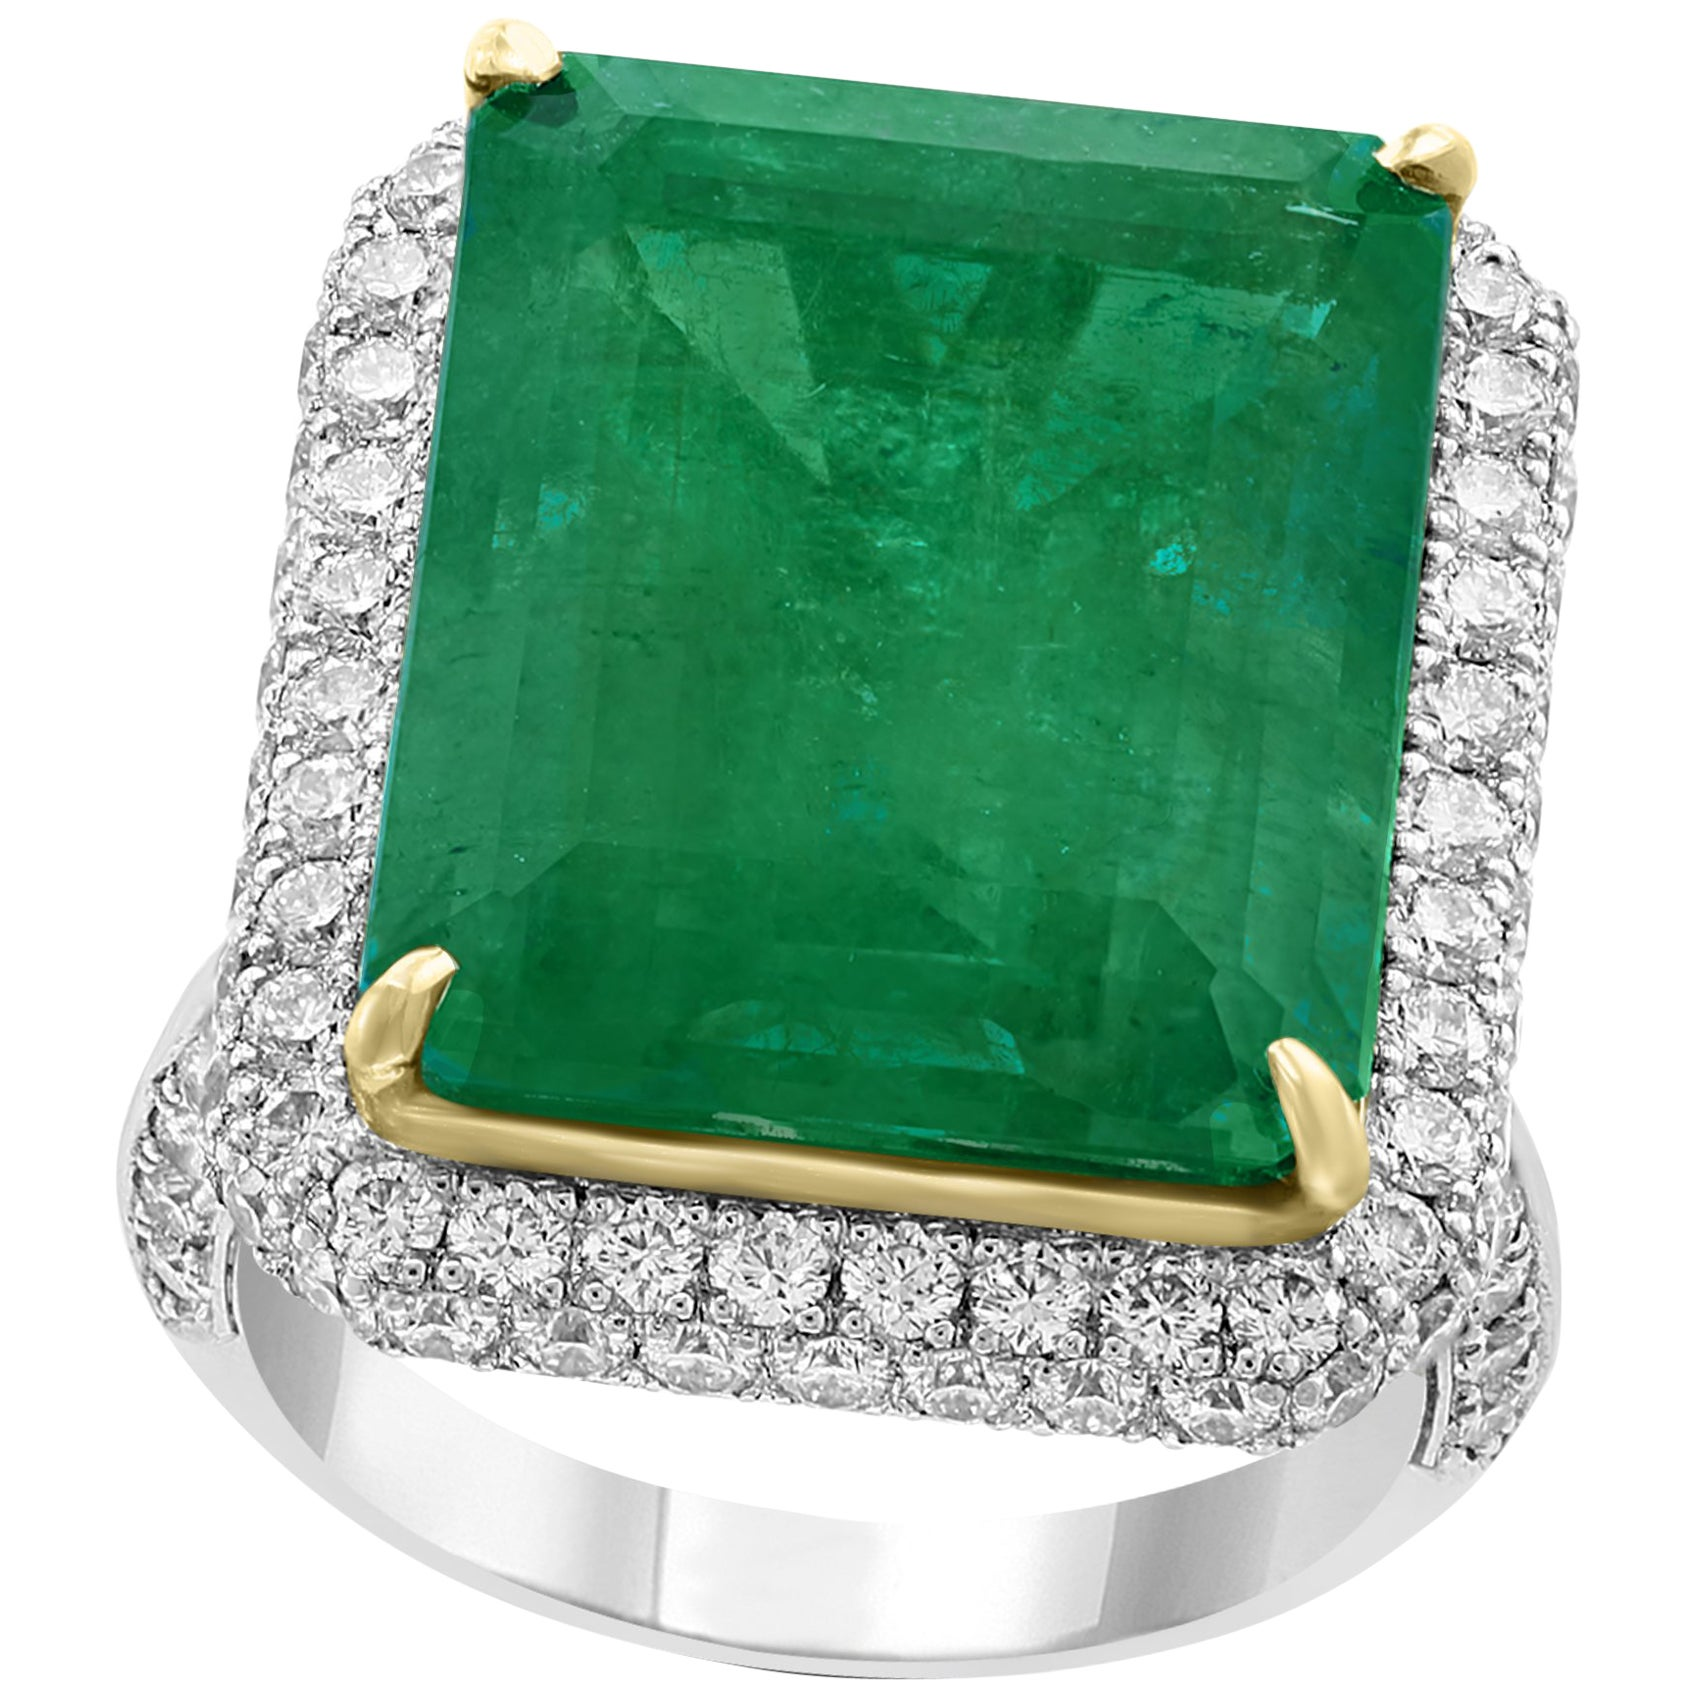 AGL Certified  13.10 Ct  Emerald Cut Colombian  Emerald  Diamond 18K Gold Ring